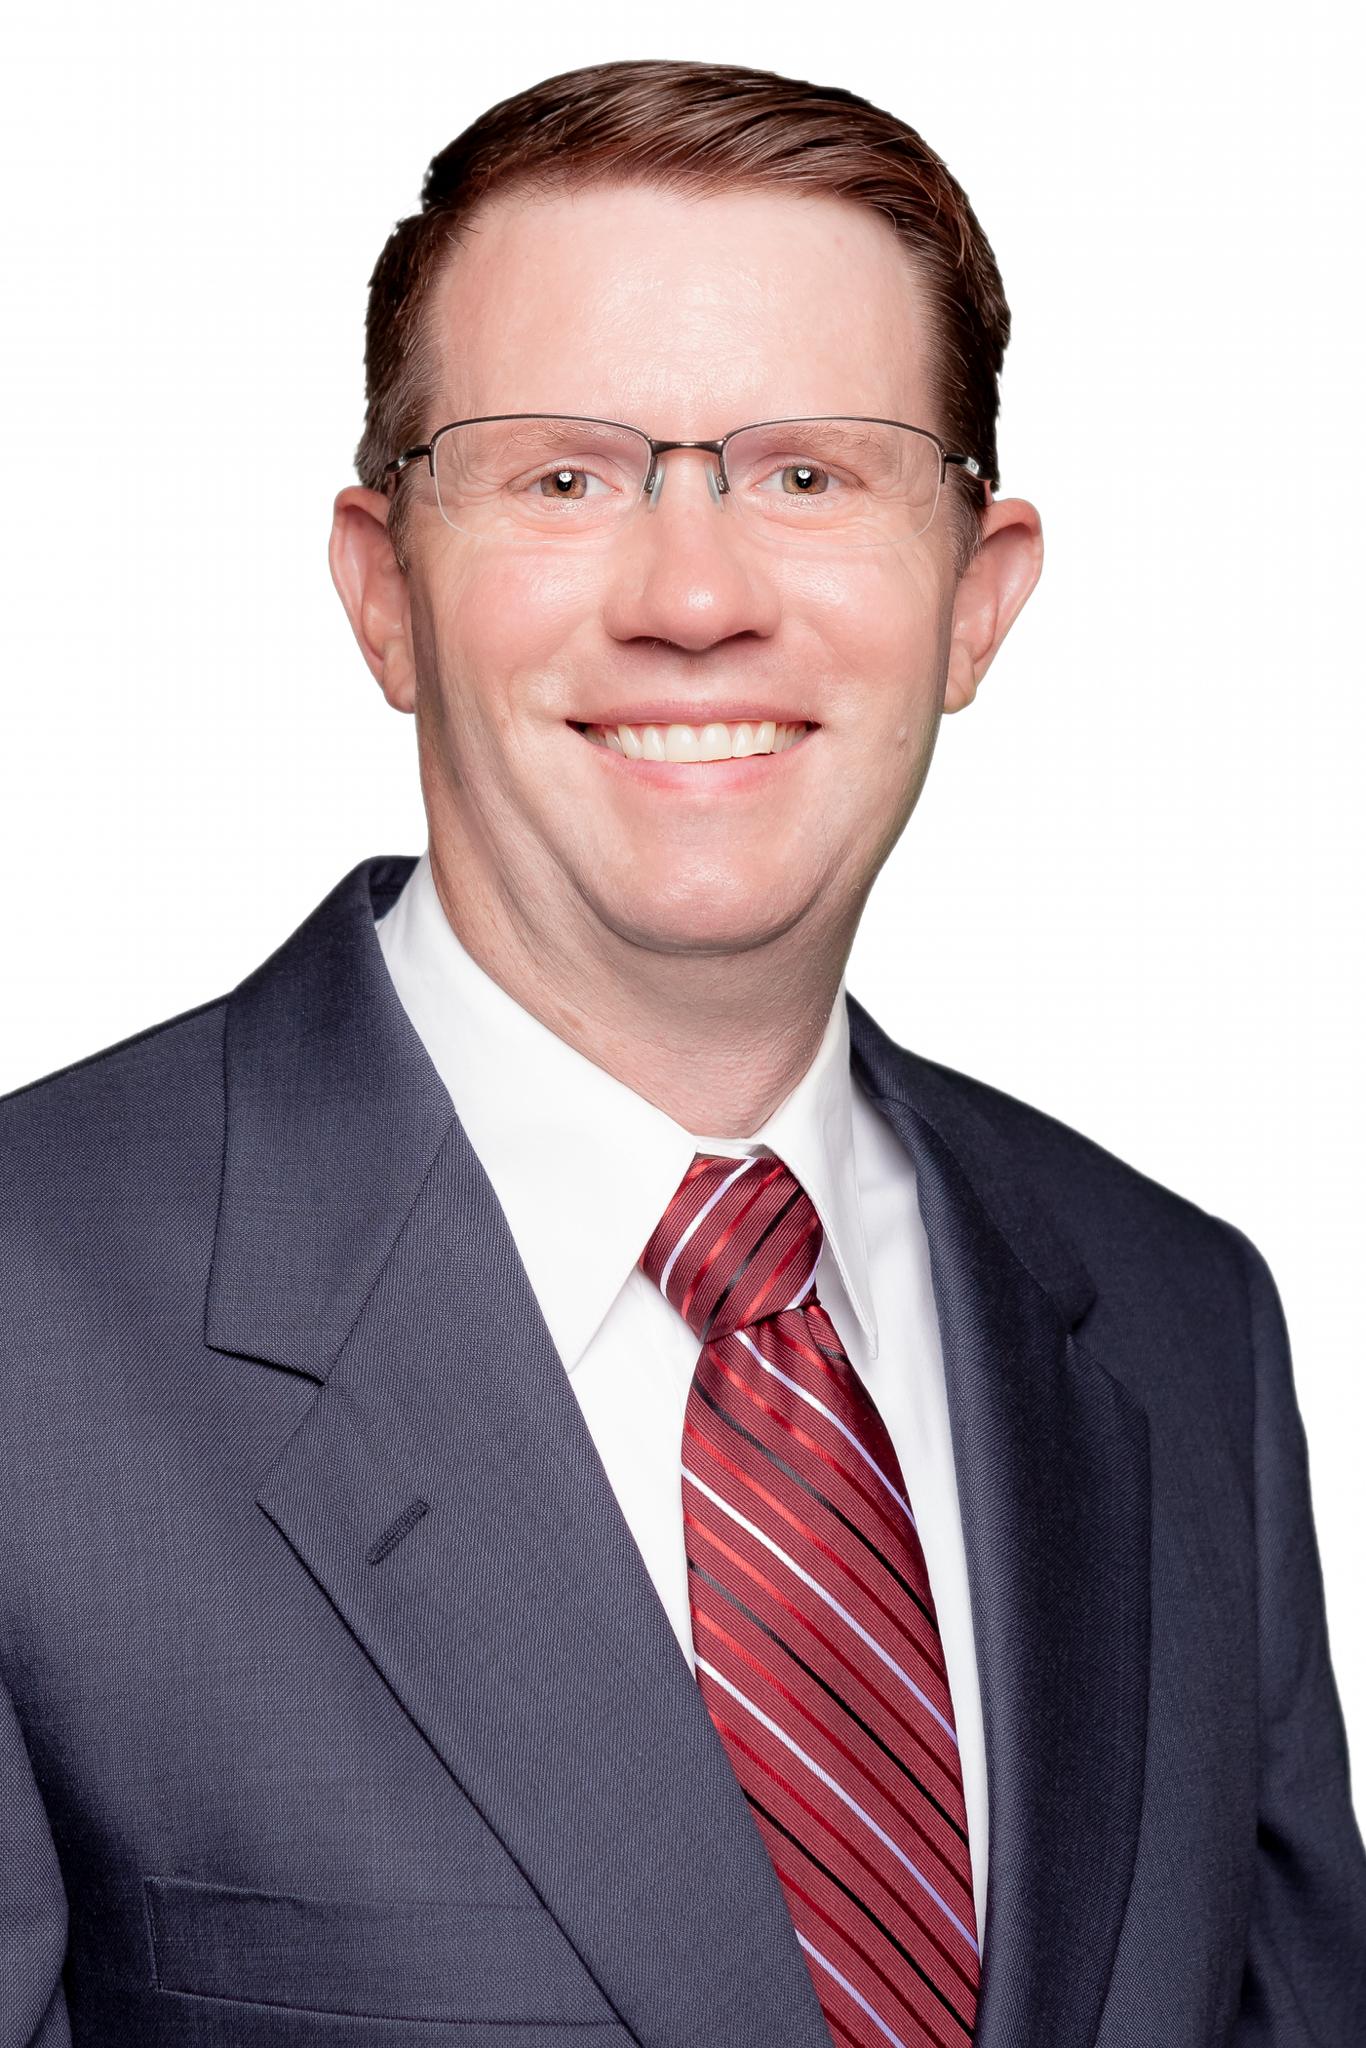 Michael A. Robinson, MD